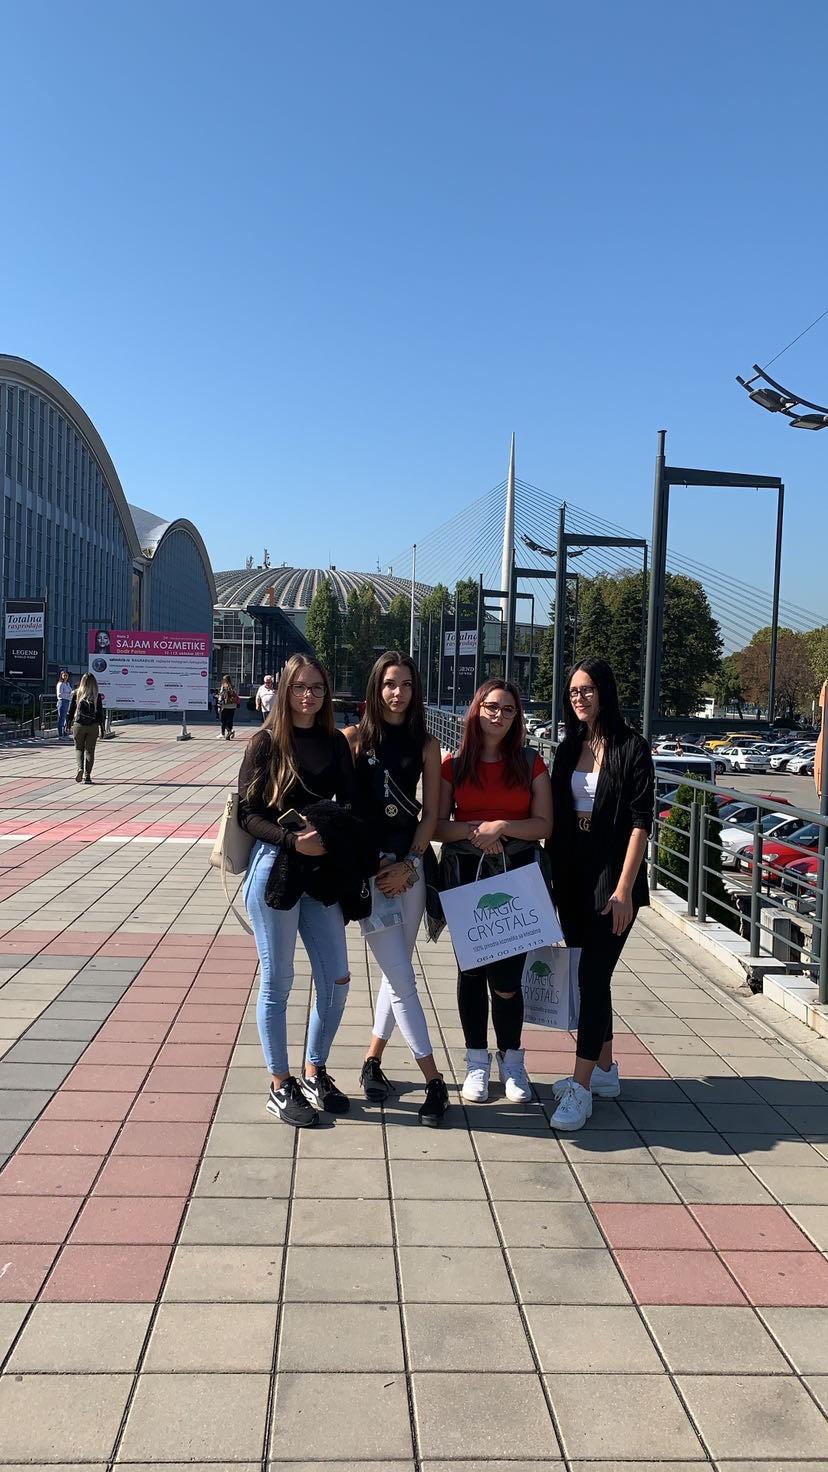 beograd-11-10-2019-in-12-10-2019-3-1